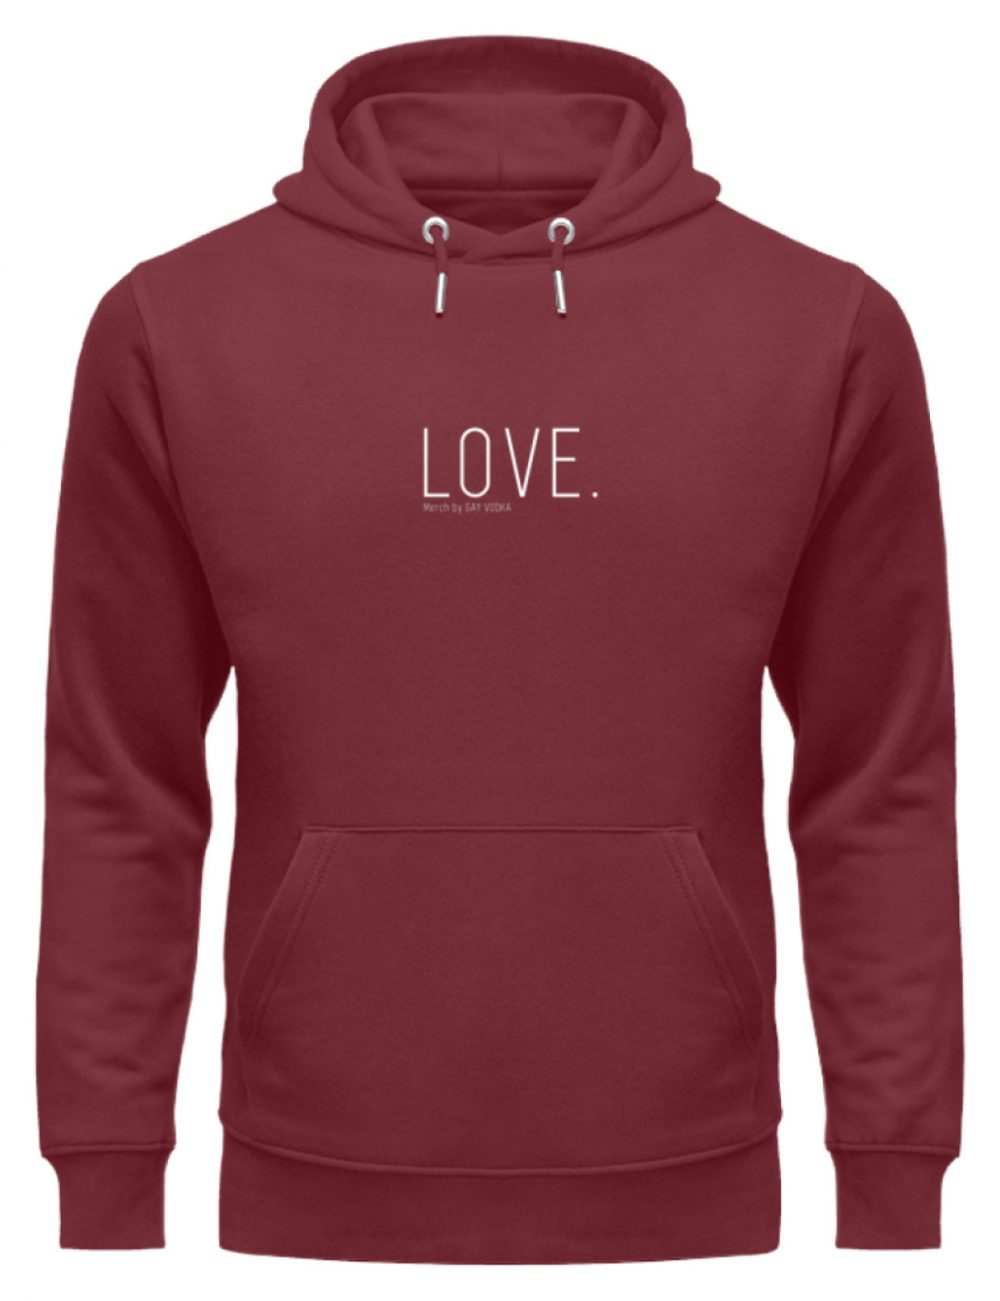 LOVE. - Unisex Organic Hoodie-6883